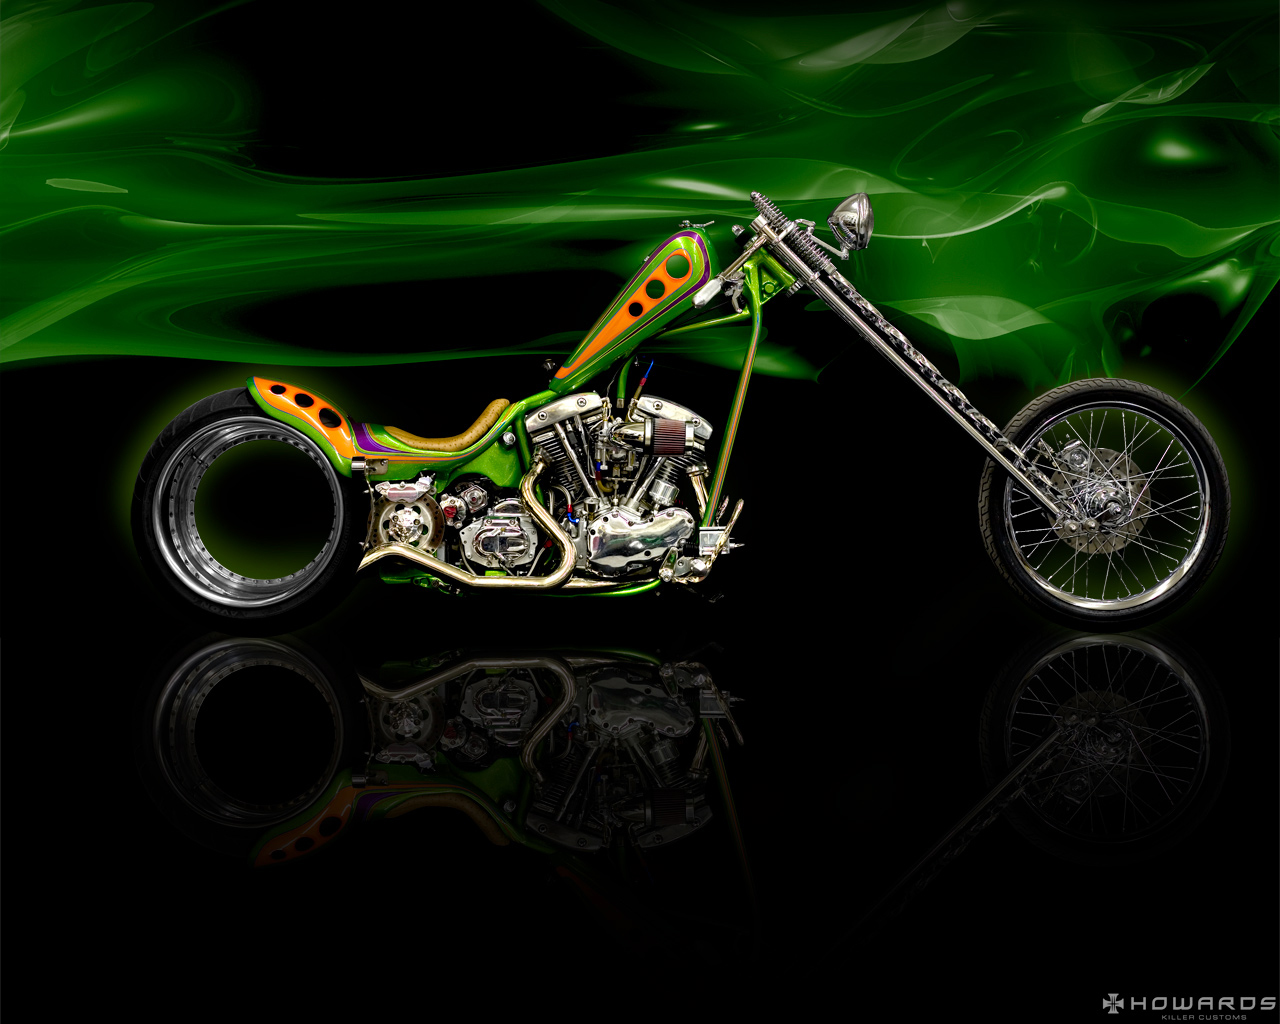 awesome bike image sports bike wallpaper bikes wallpapers heavy bike 1280x1024